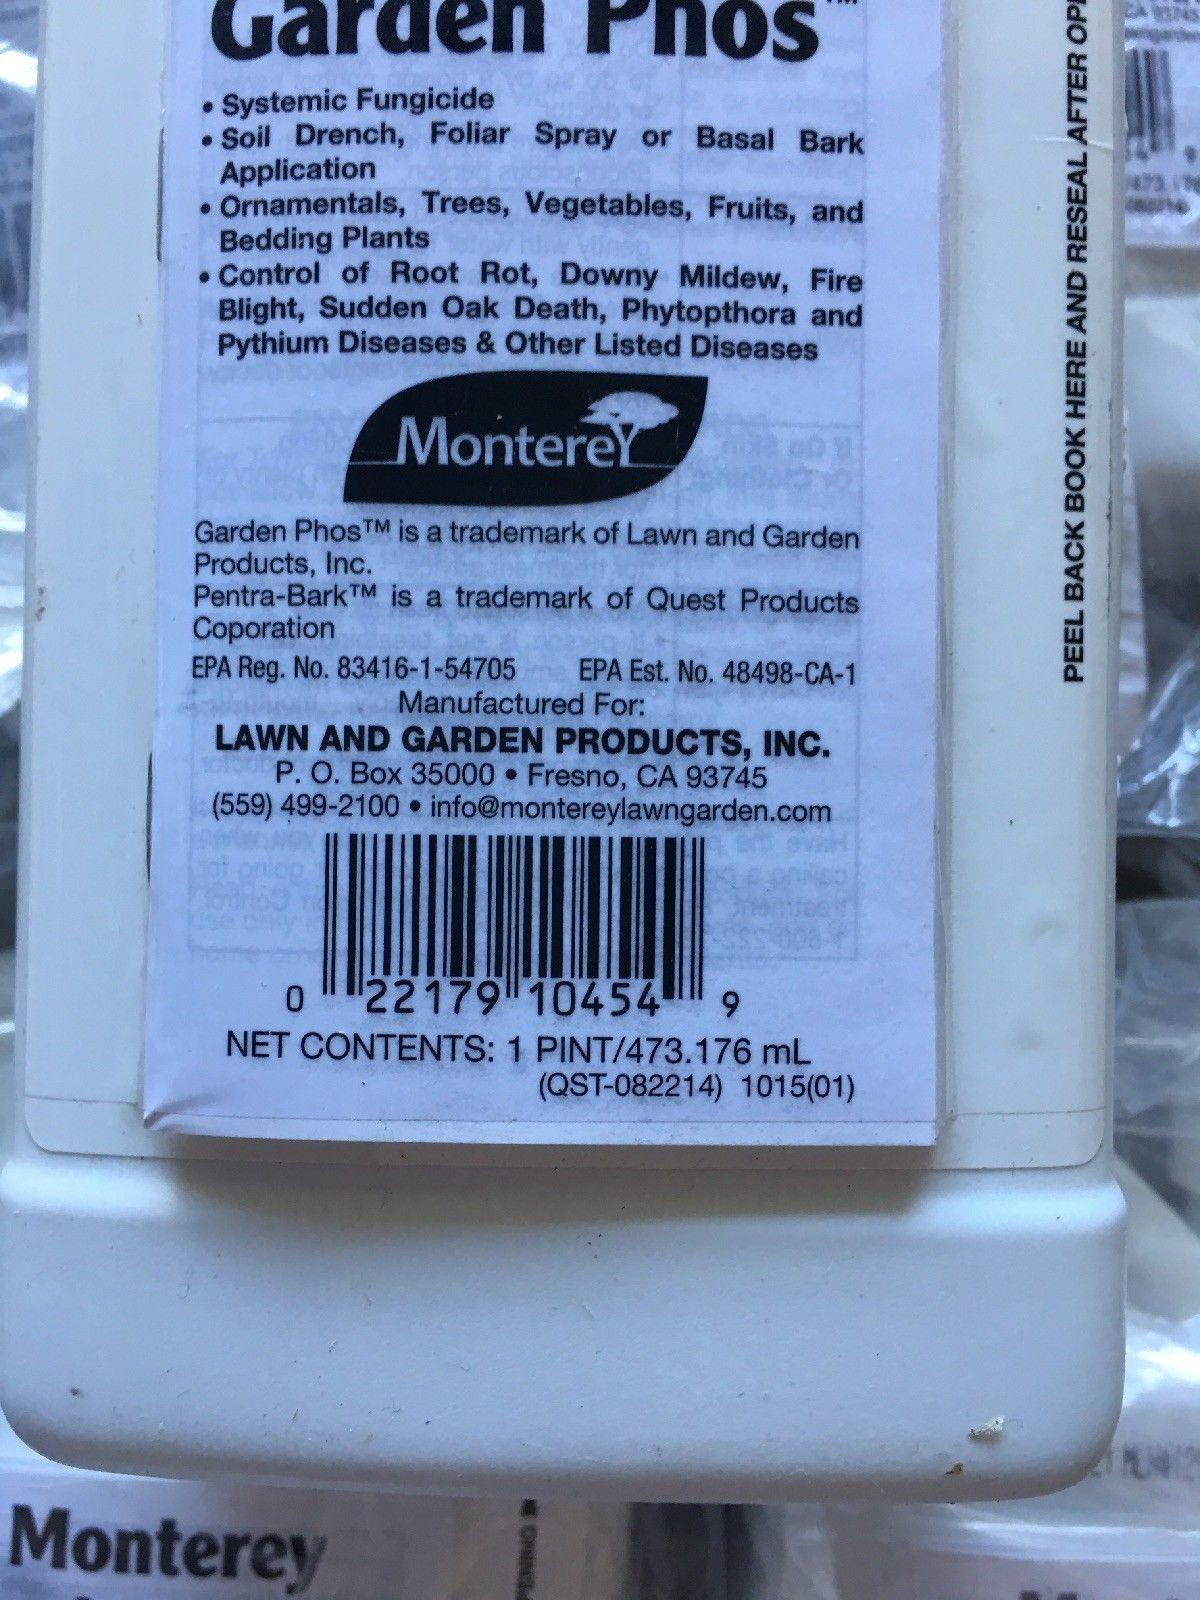 Lot 5 Monterey Garden Phos 16oz